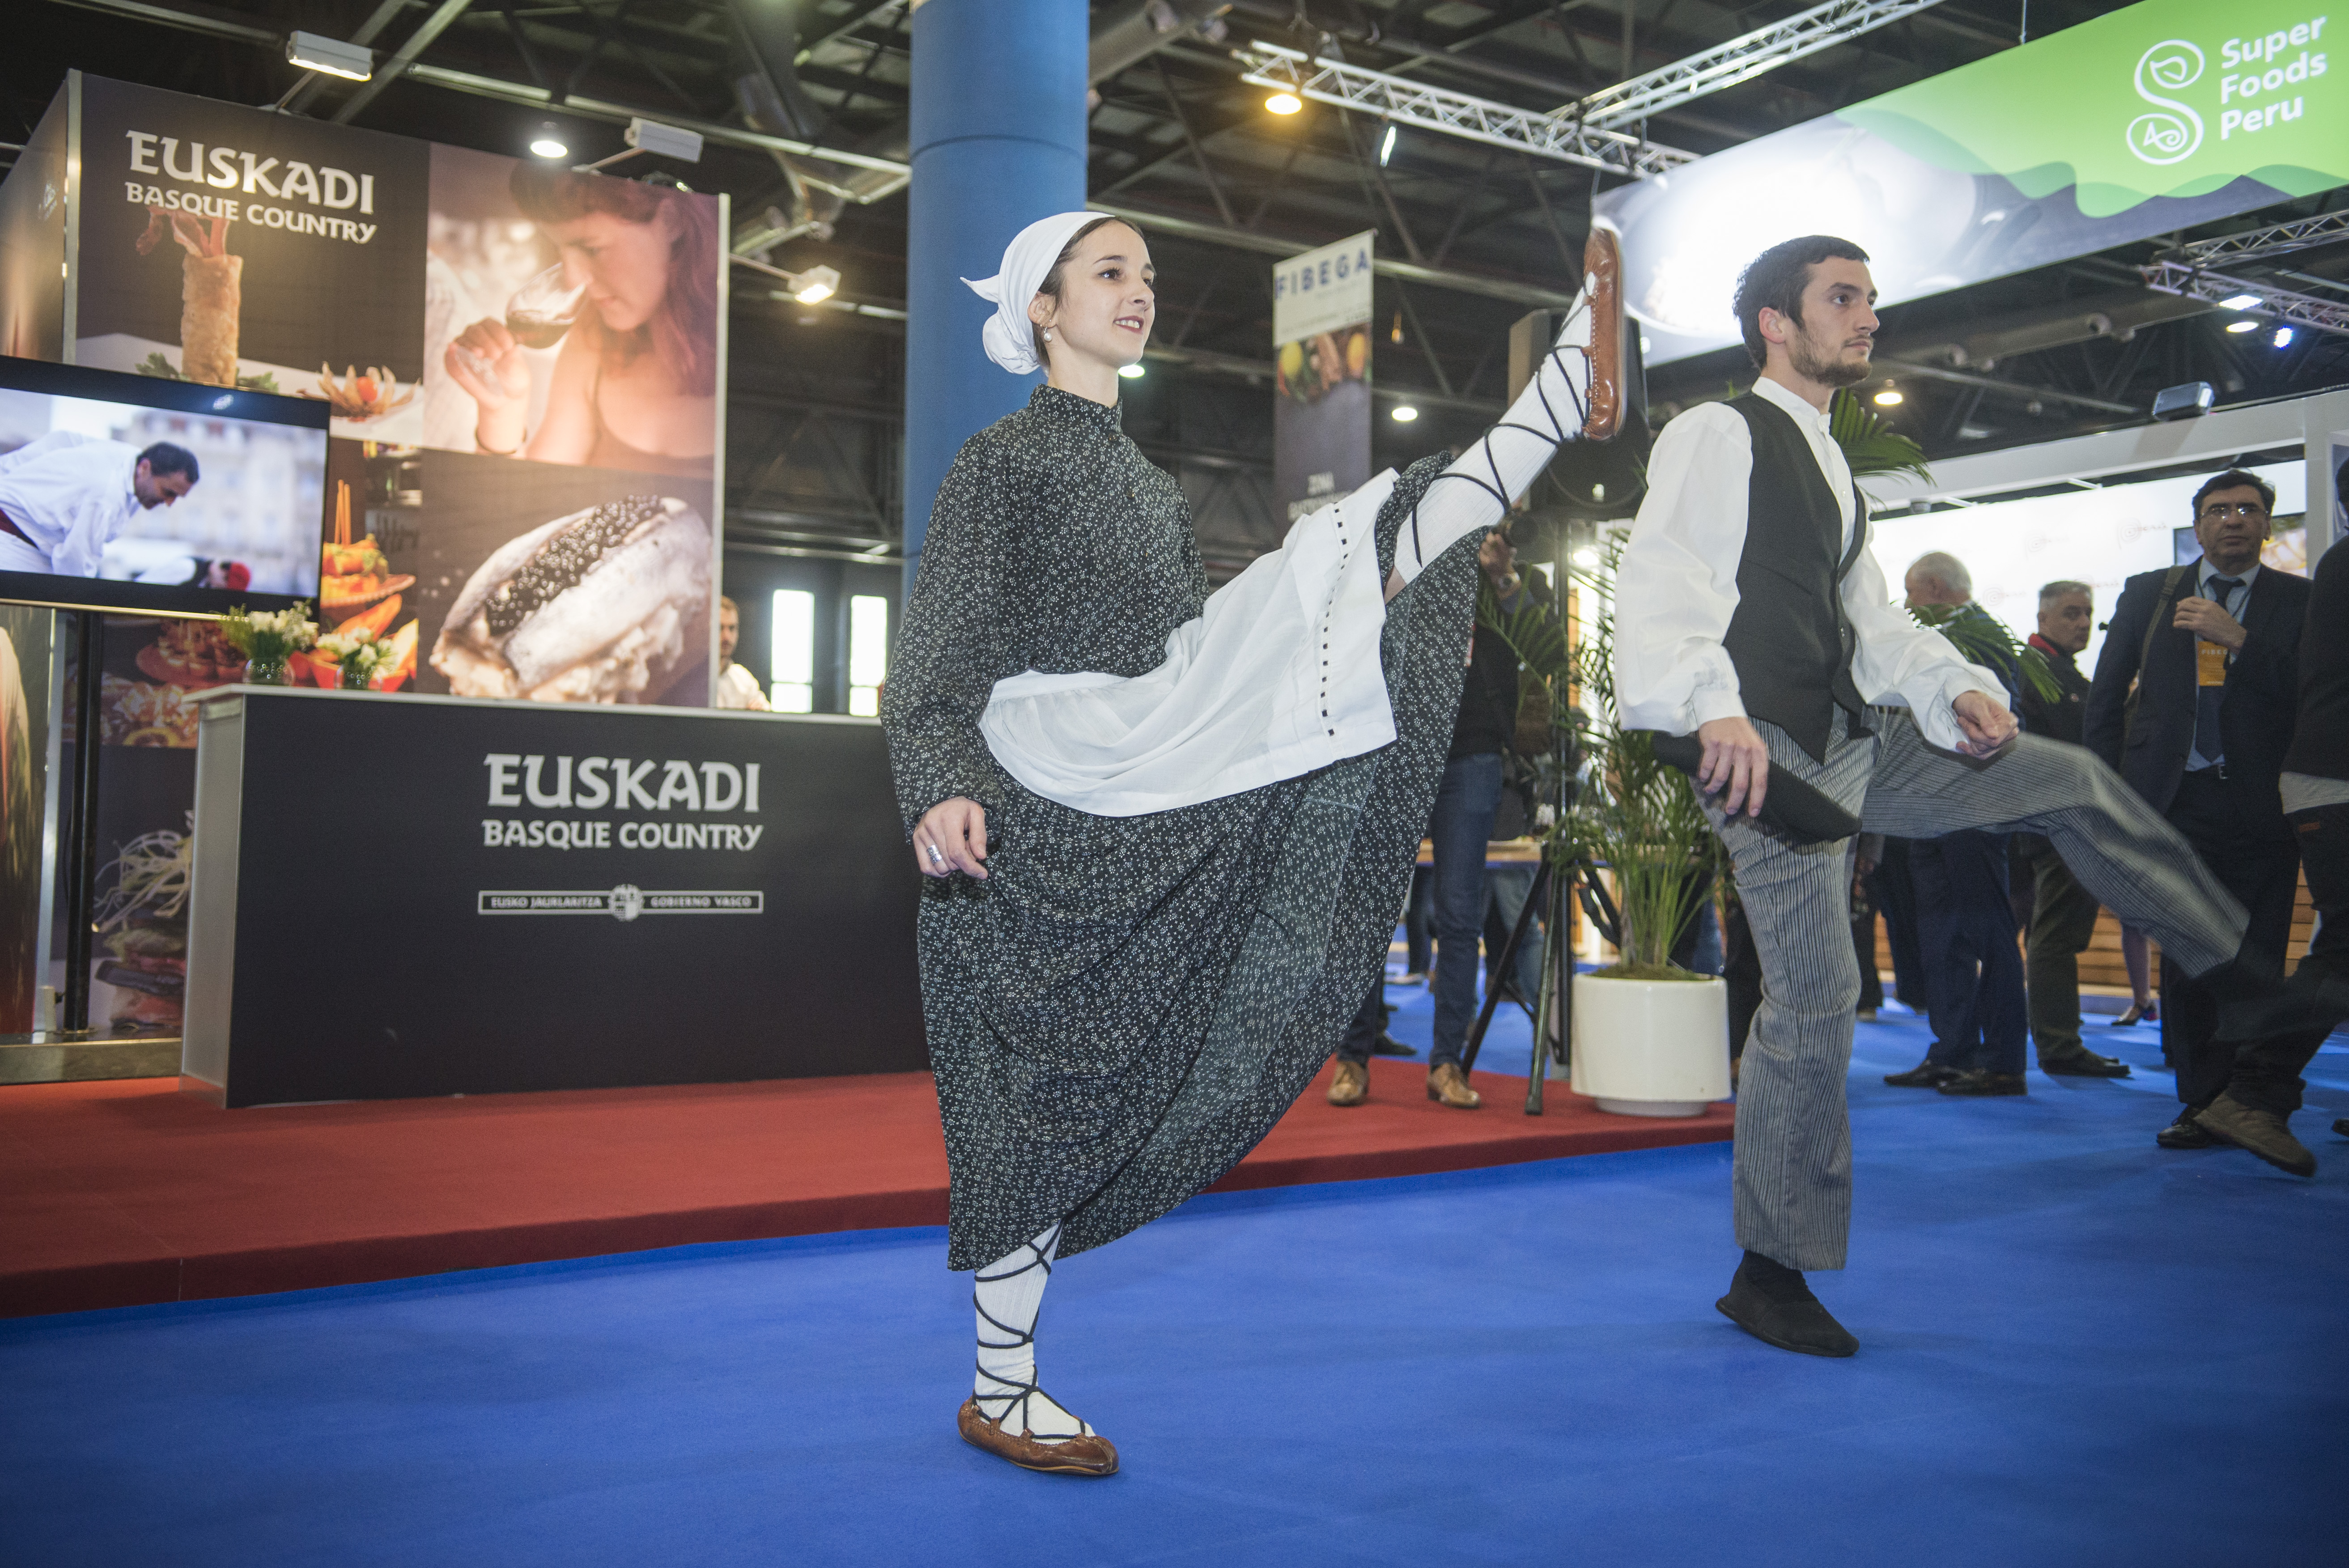 Euskadi_FIBEGA_2017_0008.jpg